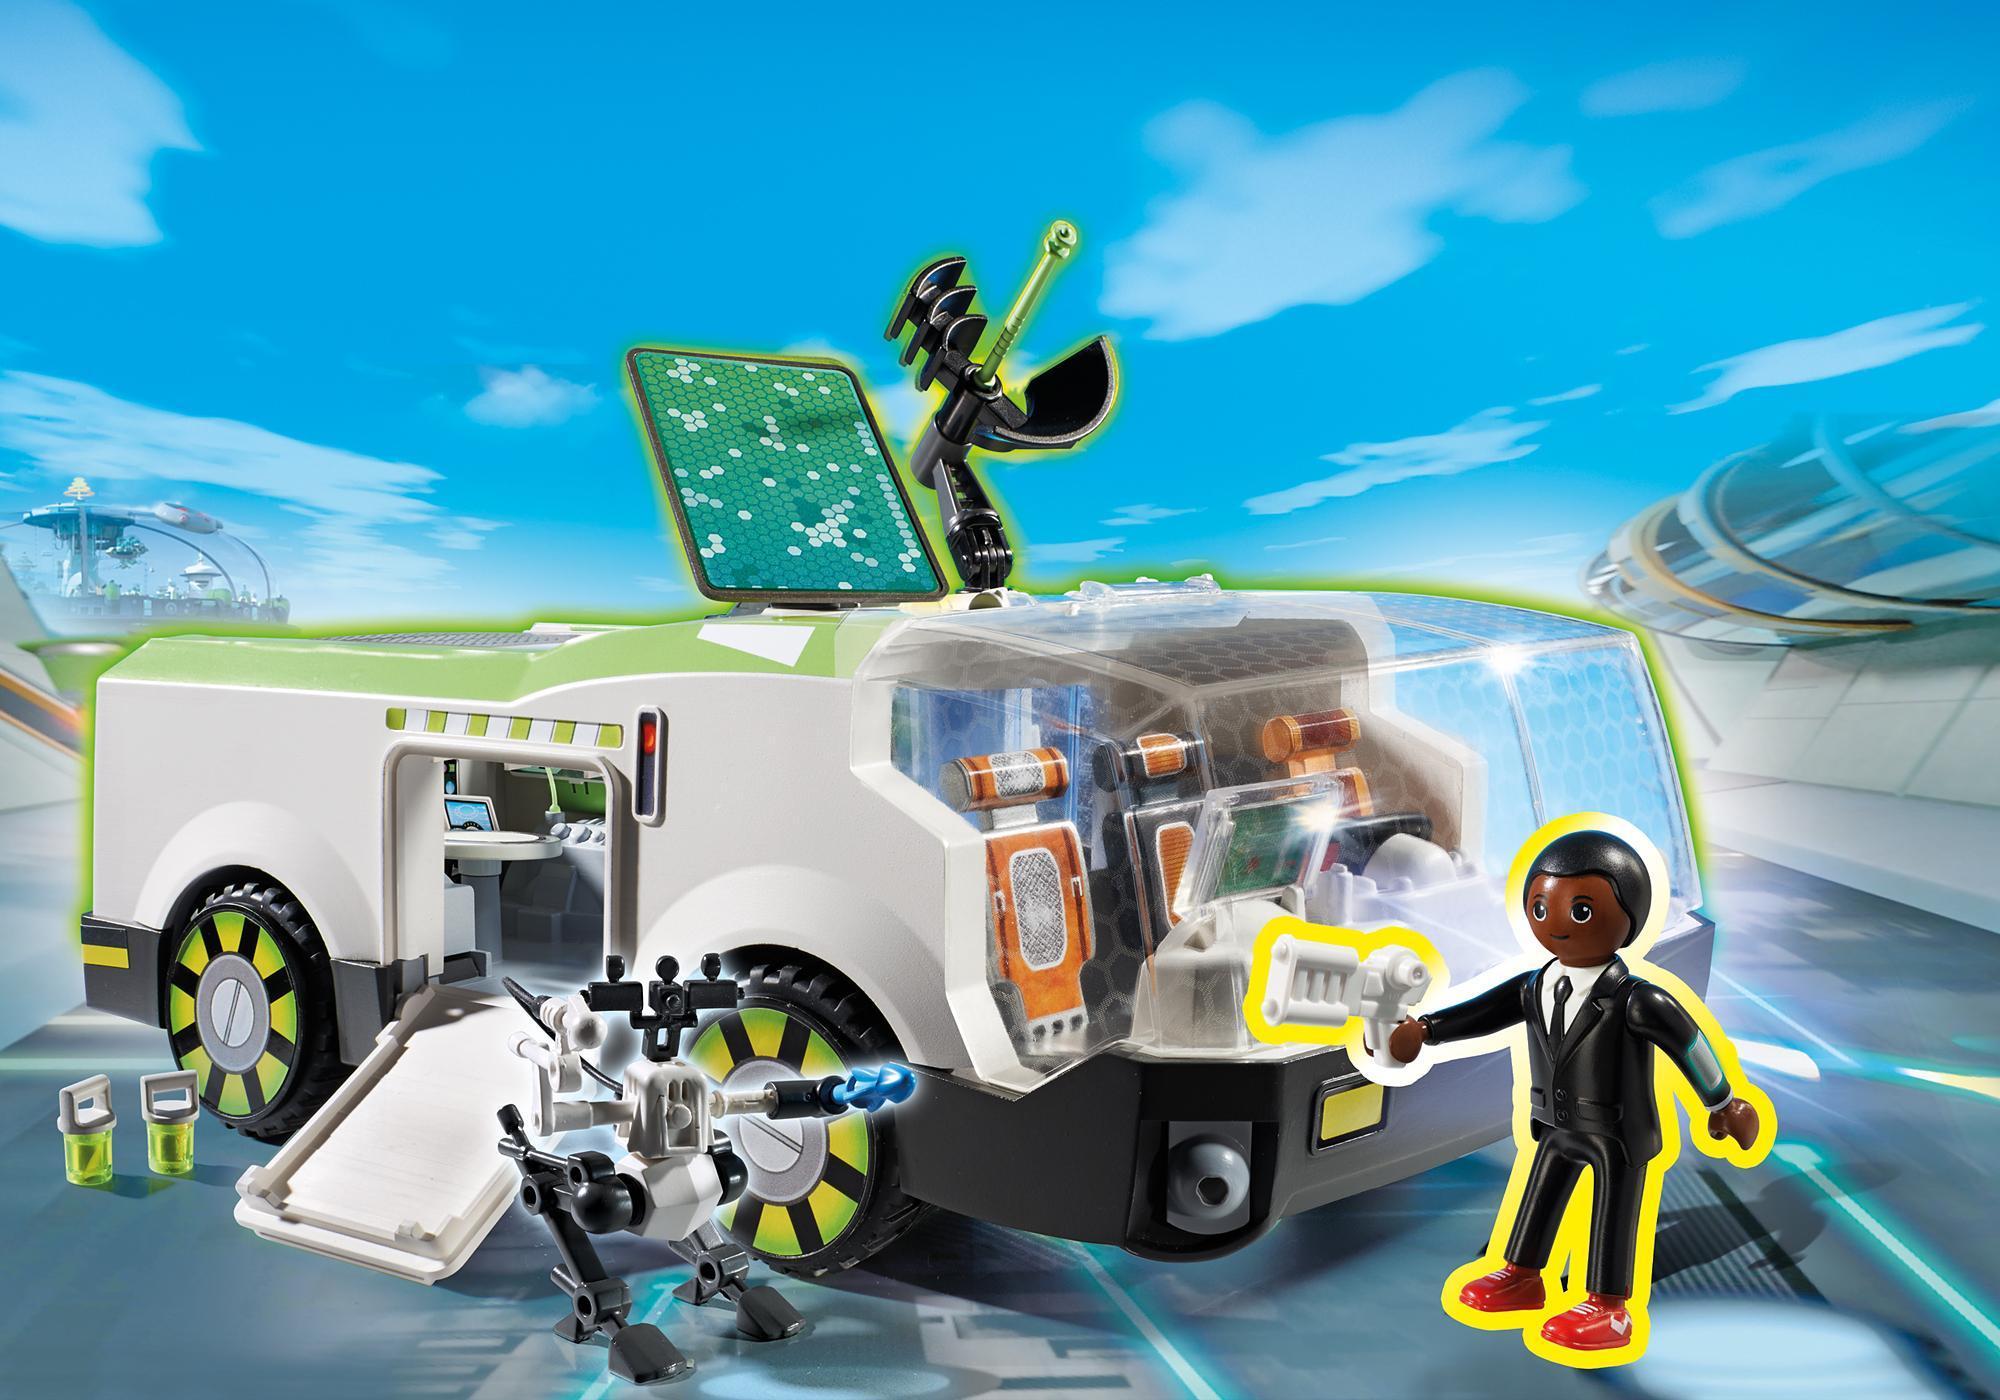 http://media.playmobil.com/i/playmobil/6692_product_detail